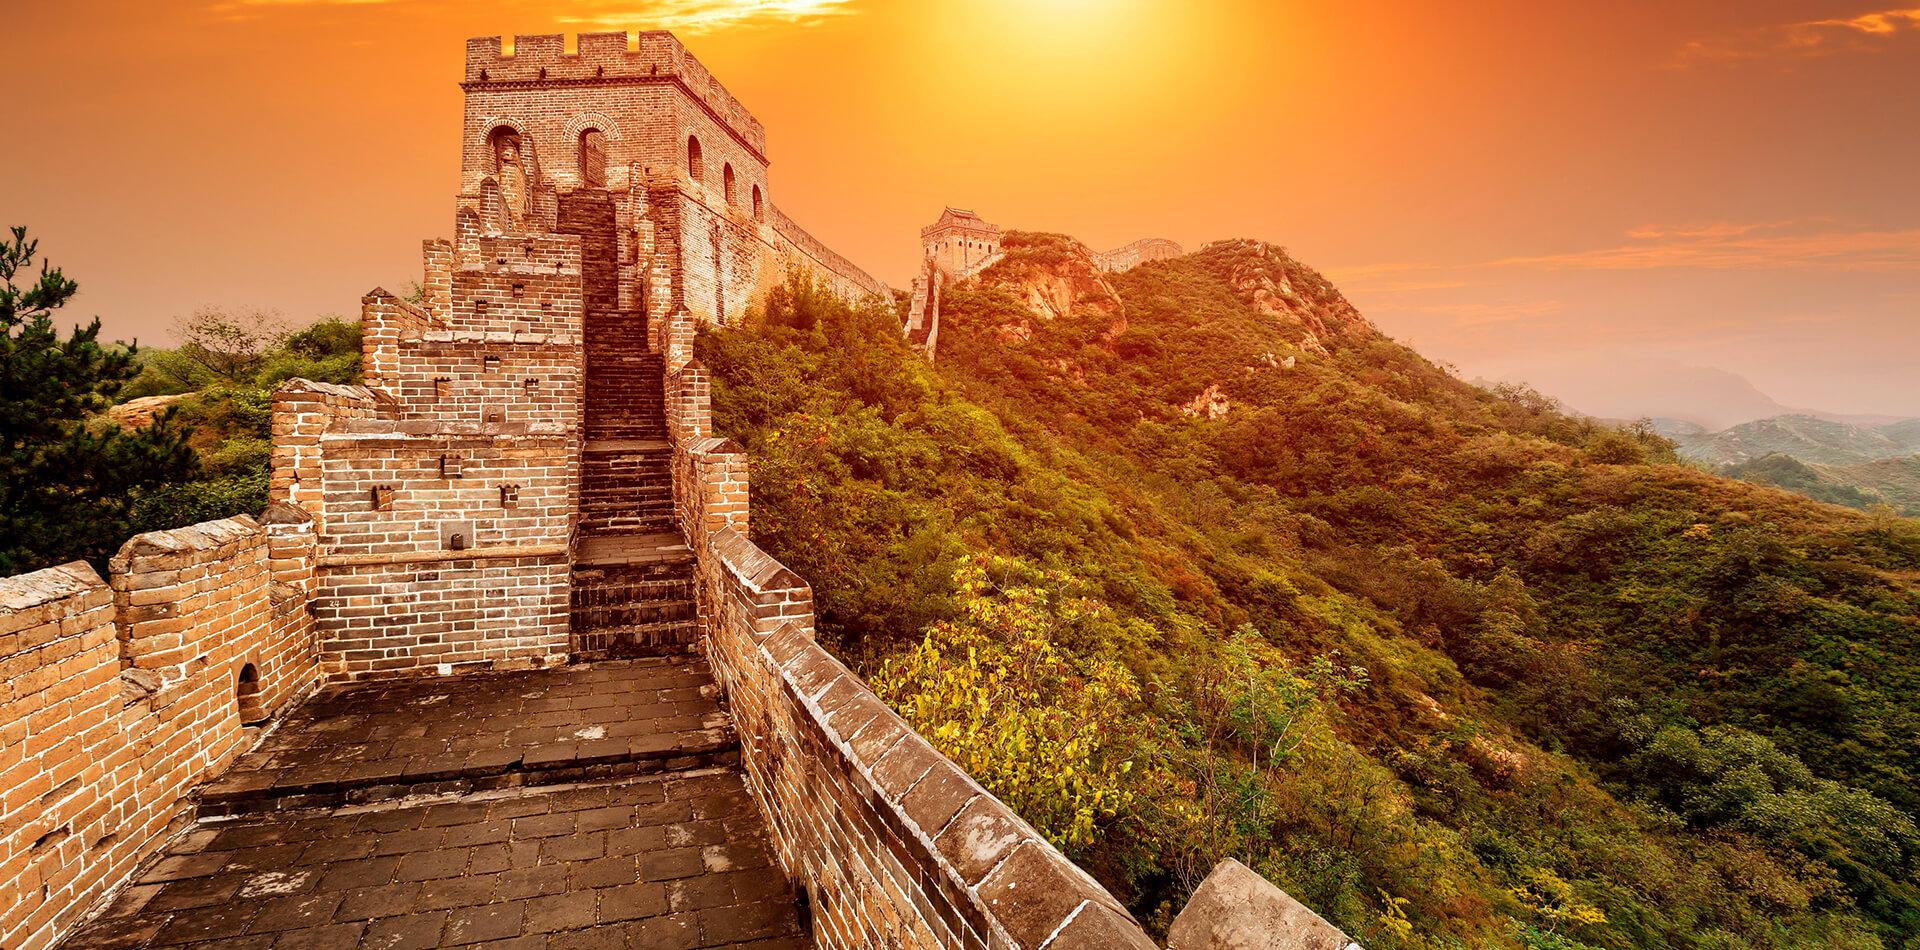 china ruta del dragón sunset nature muralla china sol paisaje